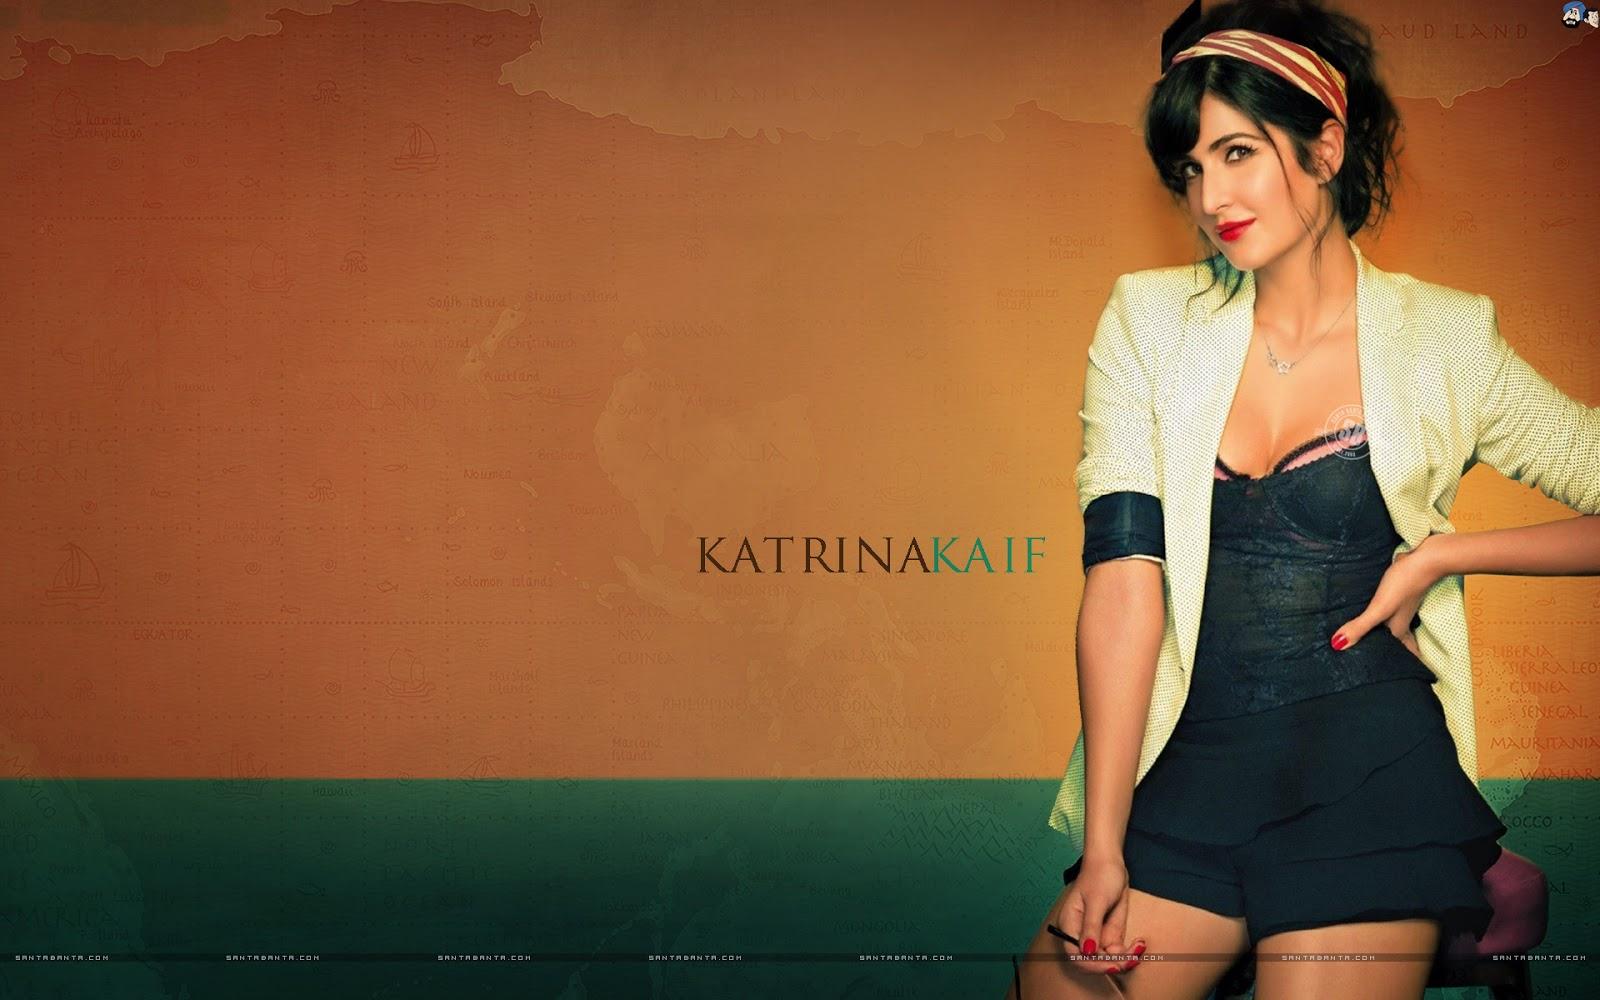 Katrina Kaif Seksi Wallpaper 12